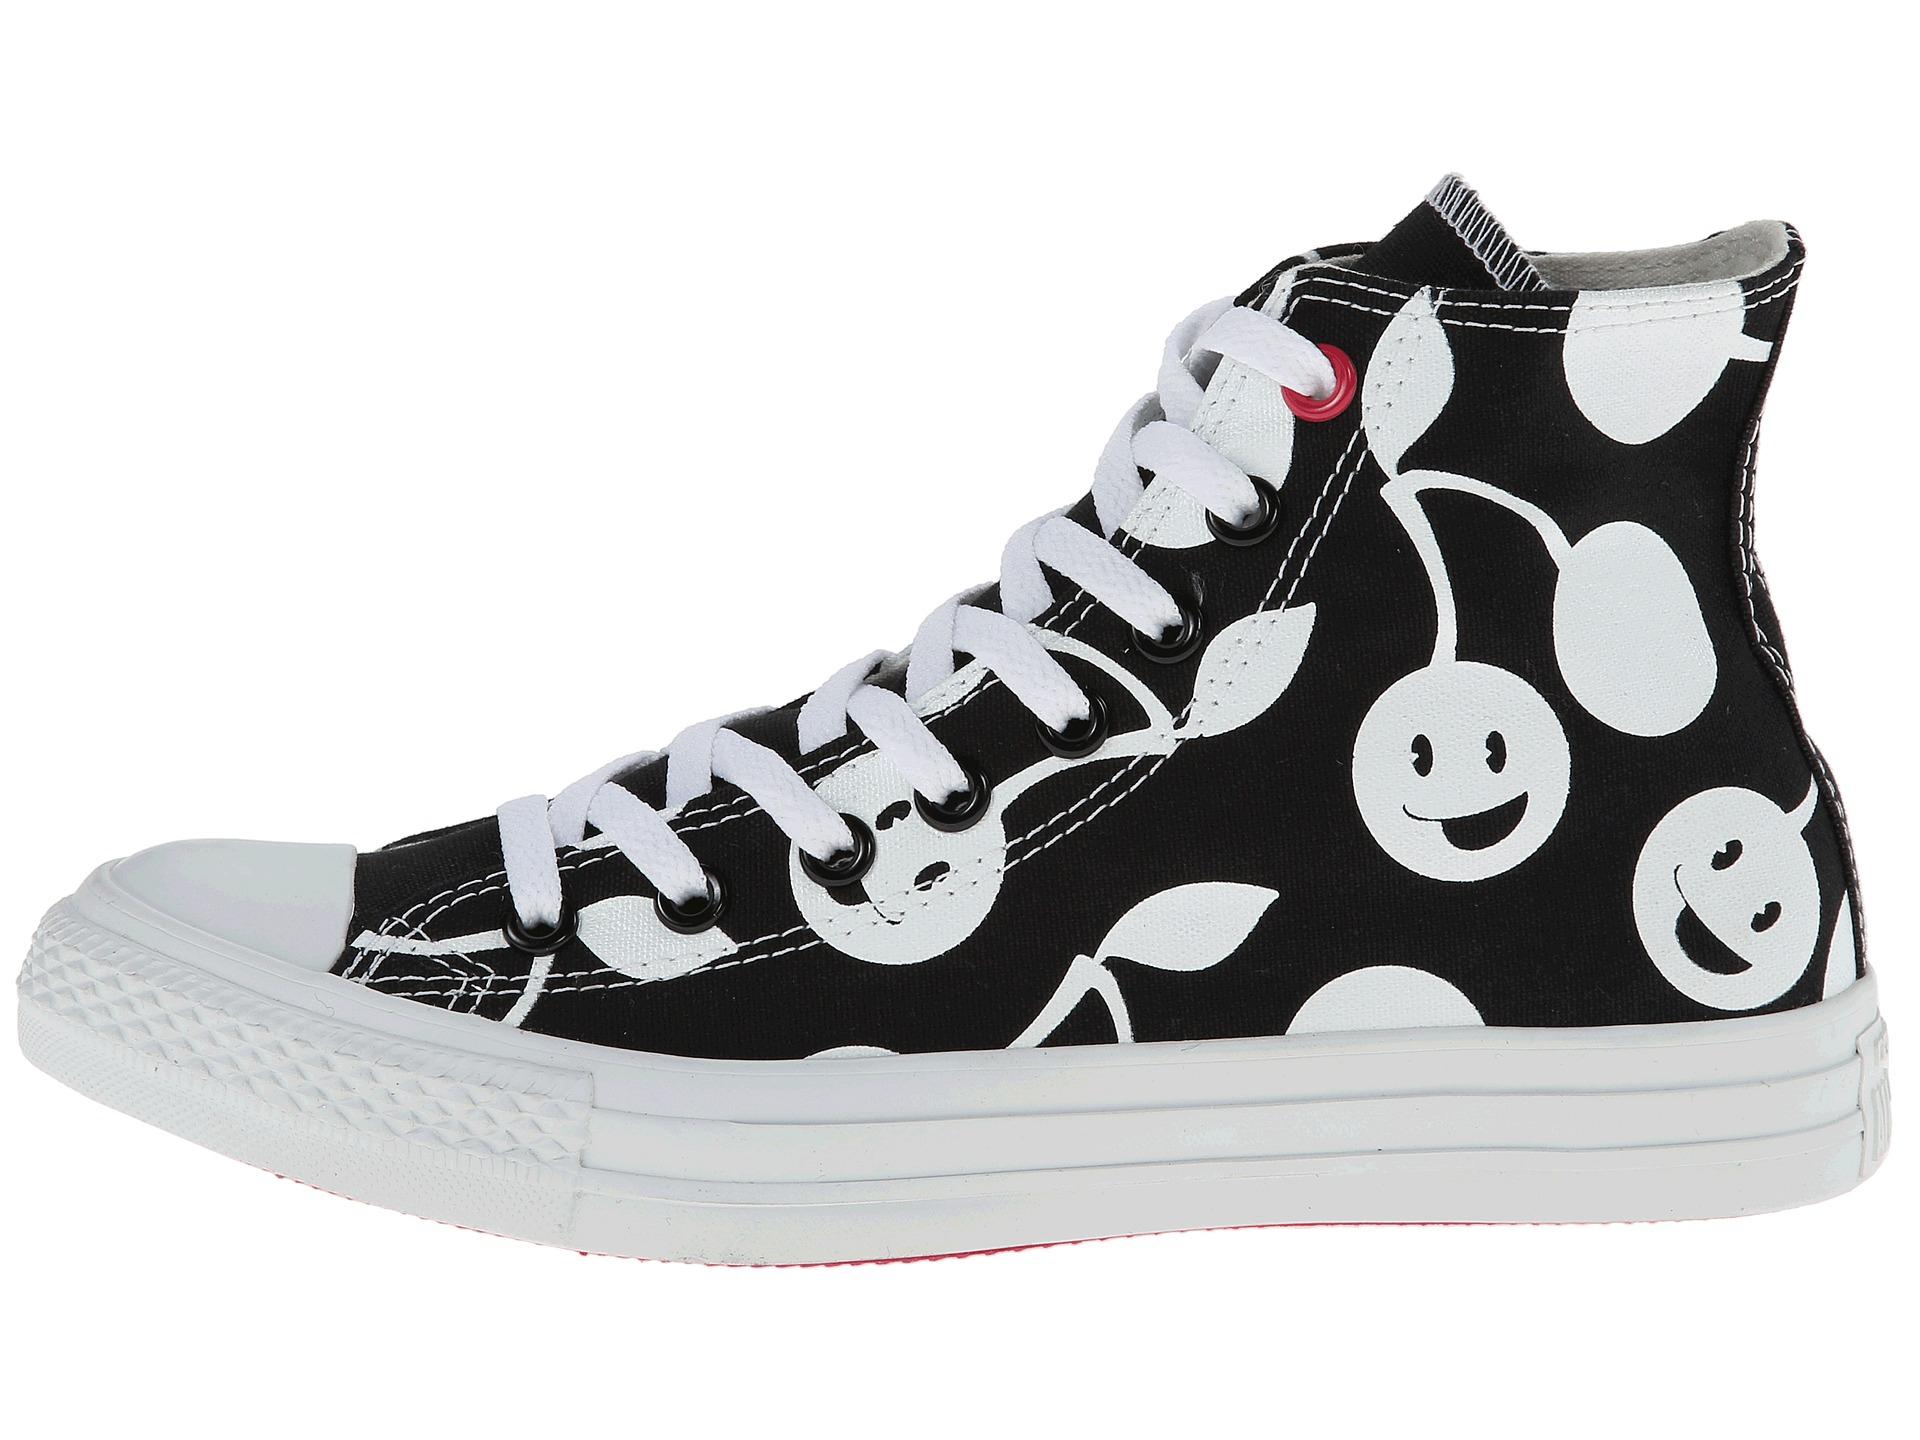 Converse Chuck Taylor® All Star® Cherry Print Hi in Black/White ...